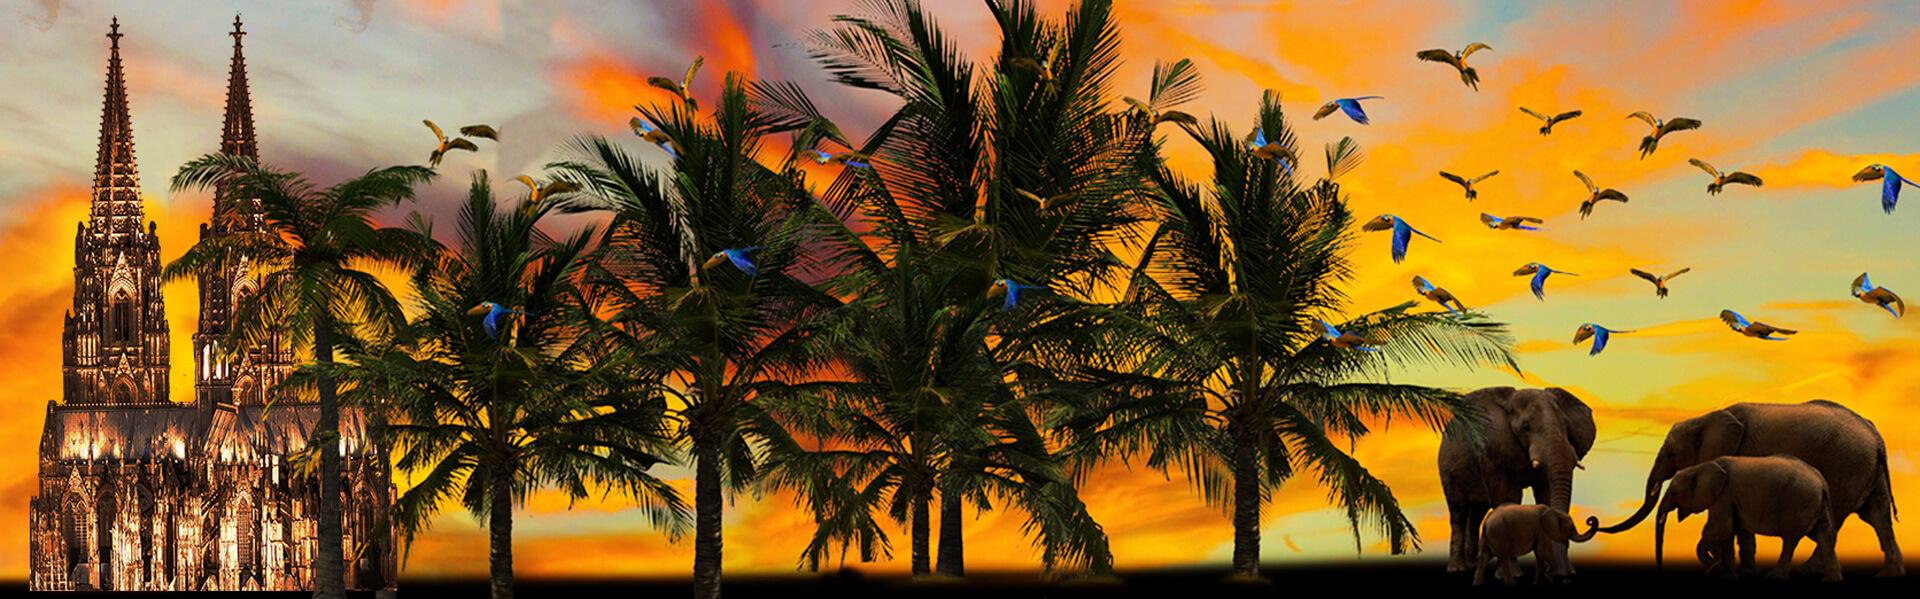 Headerbild Dom unter Palmen